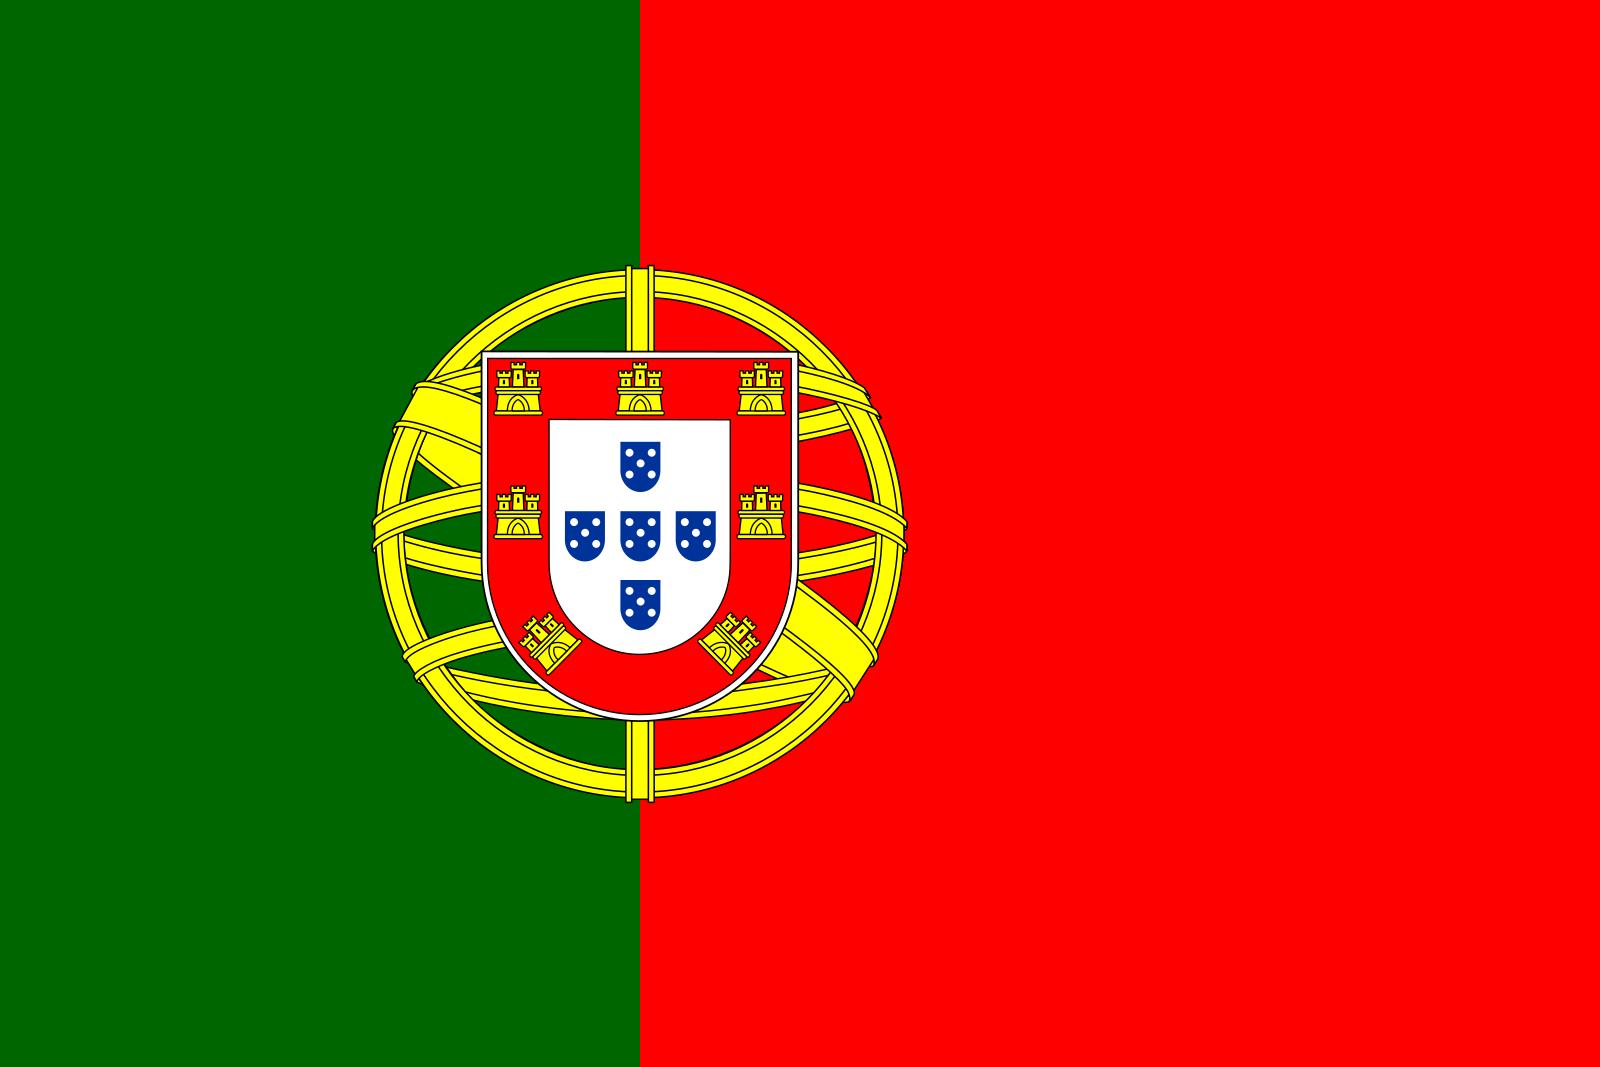 bandeira-de-portugal-1